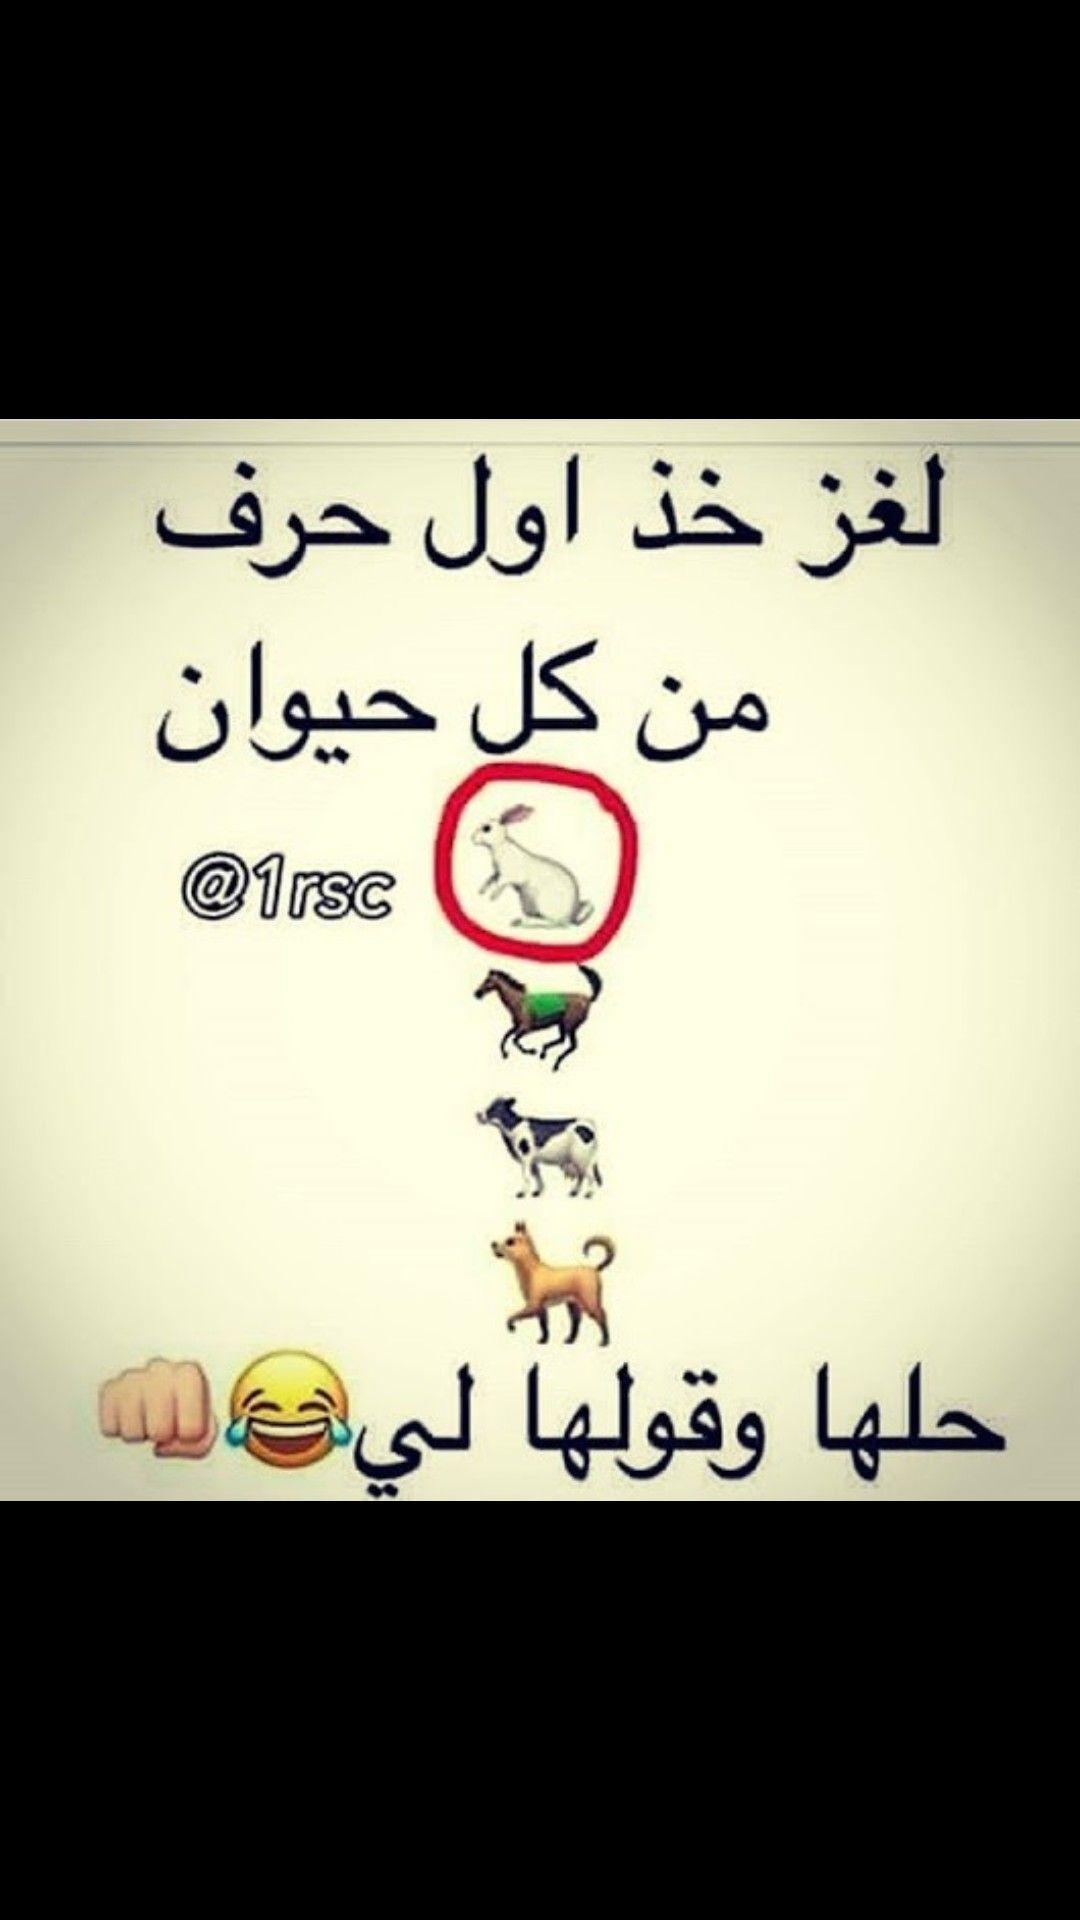 Pin By Jucj Hxhx On Photography Funny Arabic Quotes Arabic